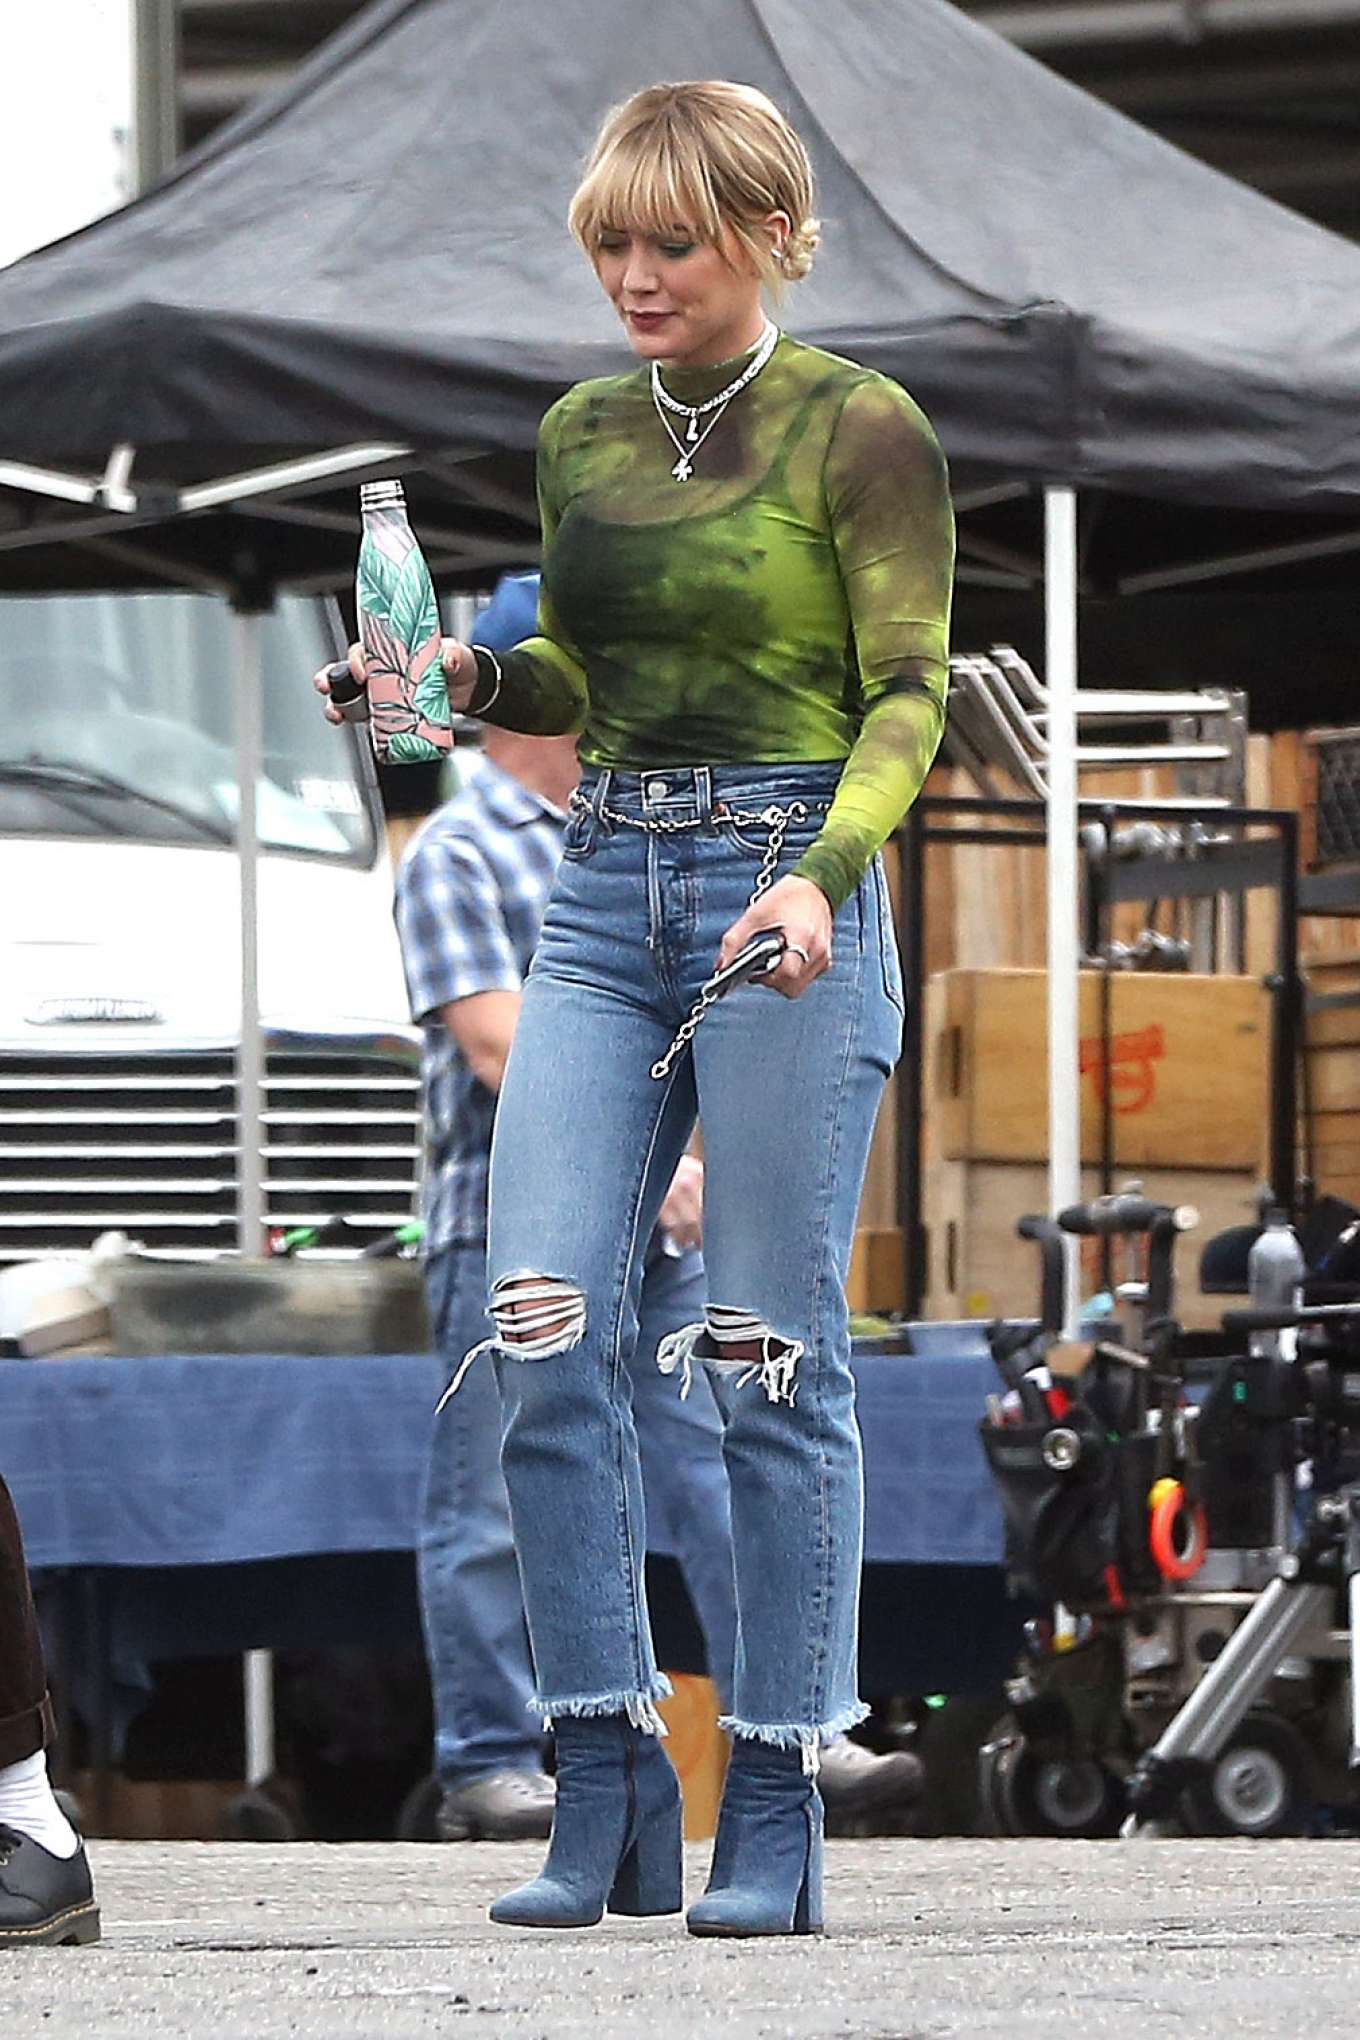 Hilary Duff 2019 : Hilary Duff – Takes a break while filming Lizzie McGuire-20